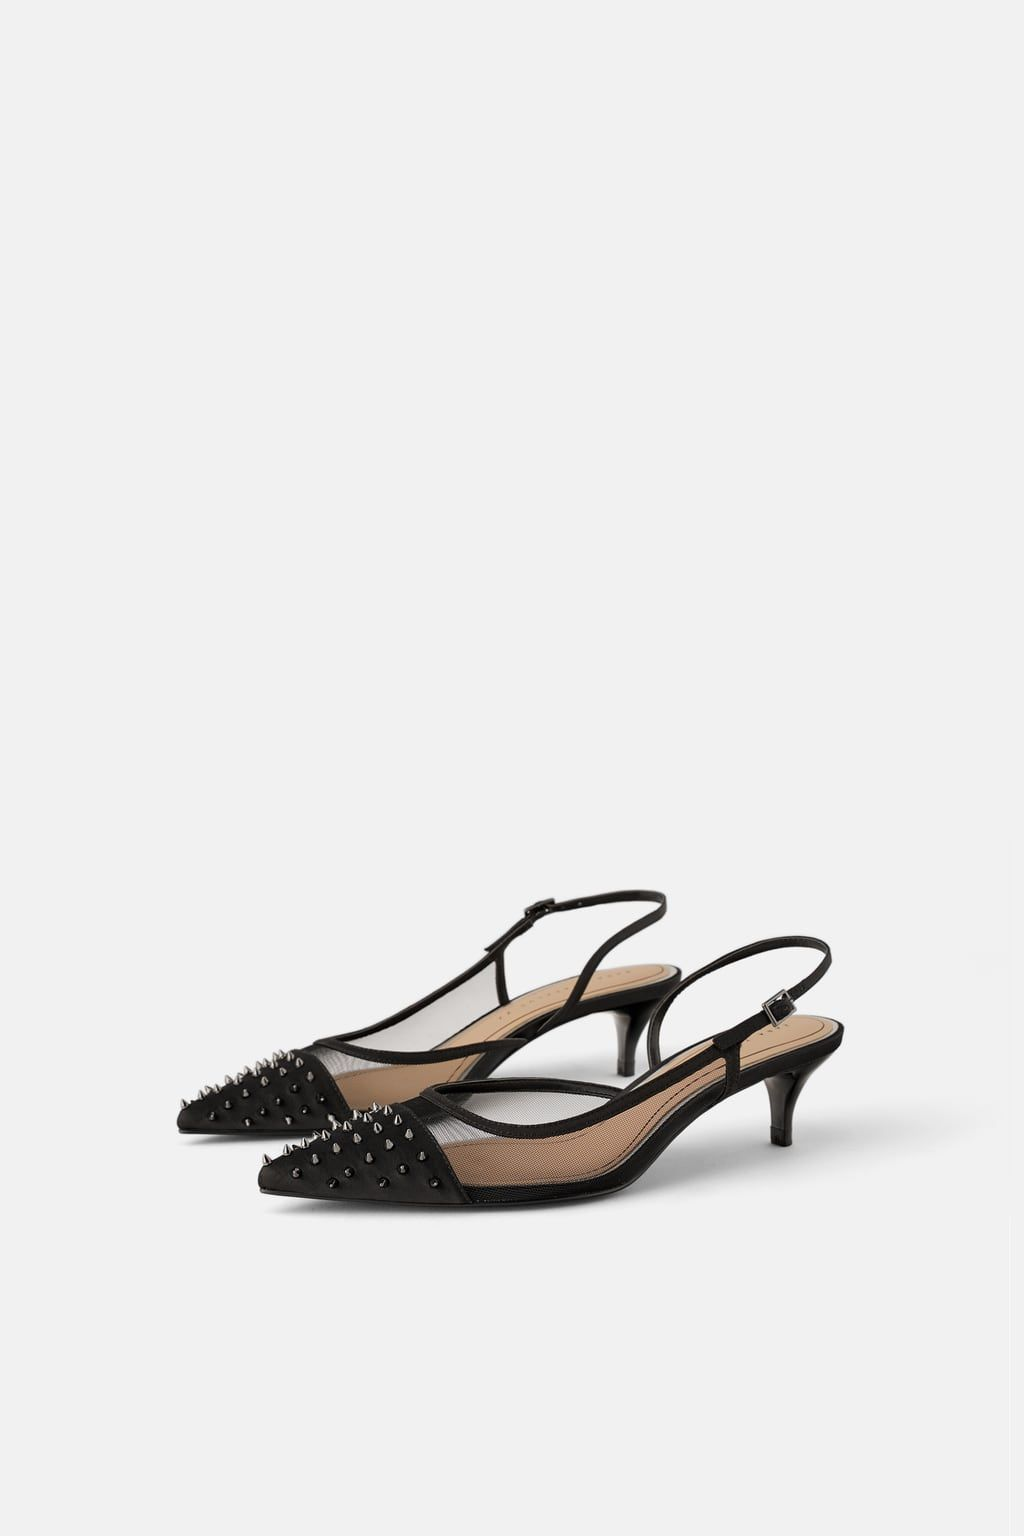 Studded Mesh Slingback Heels Black Slingback Heels Slingback